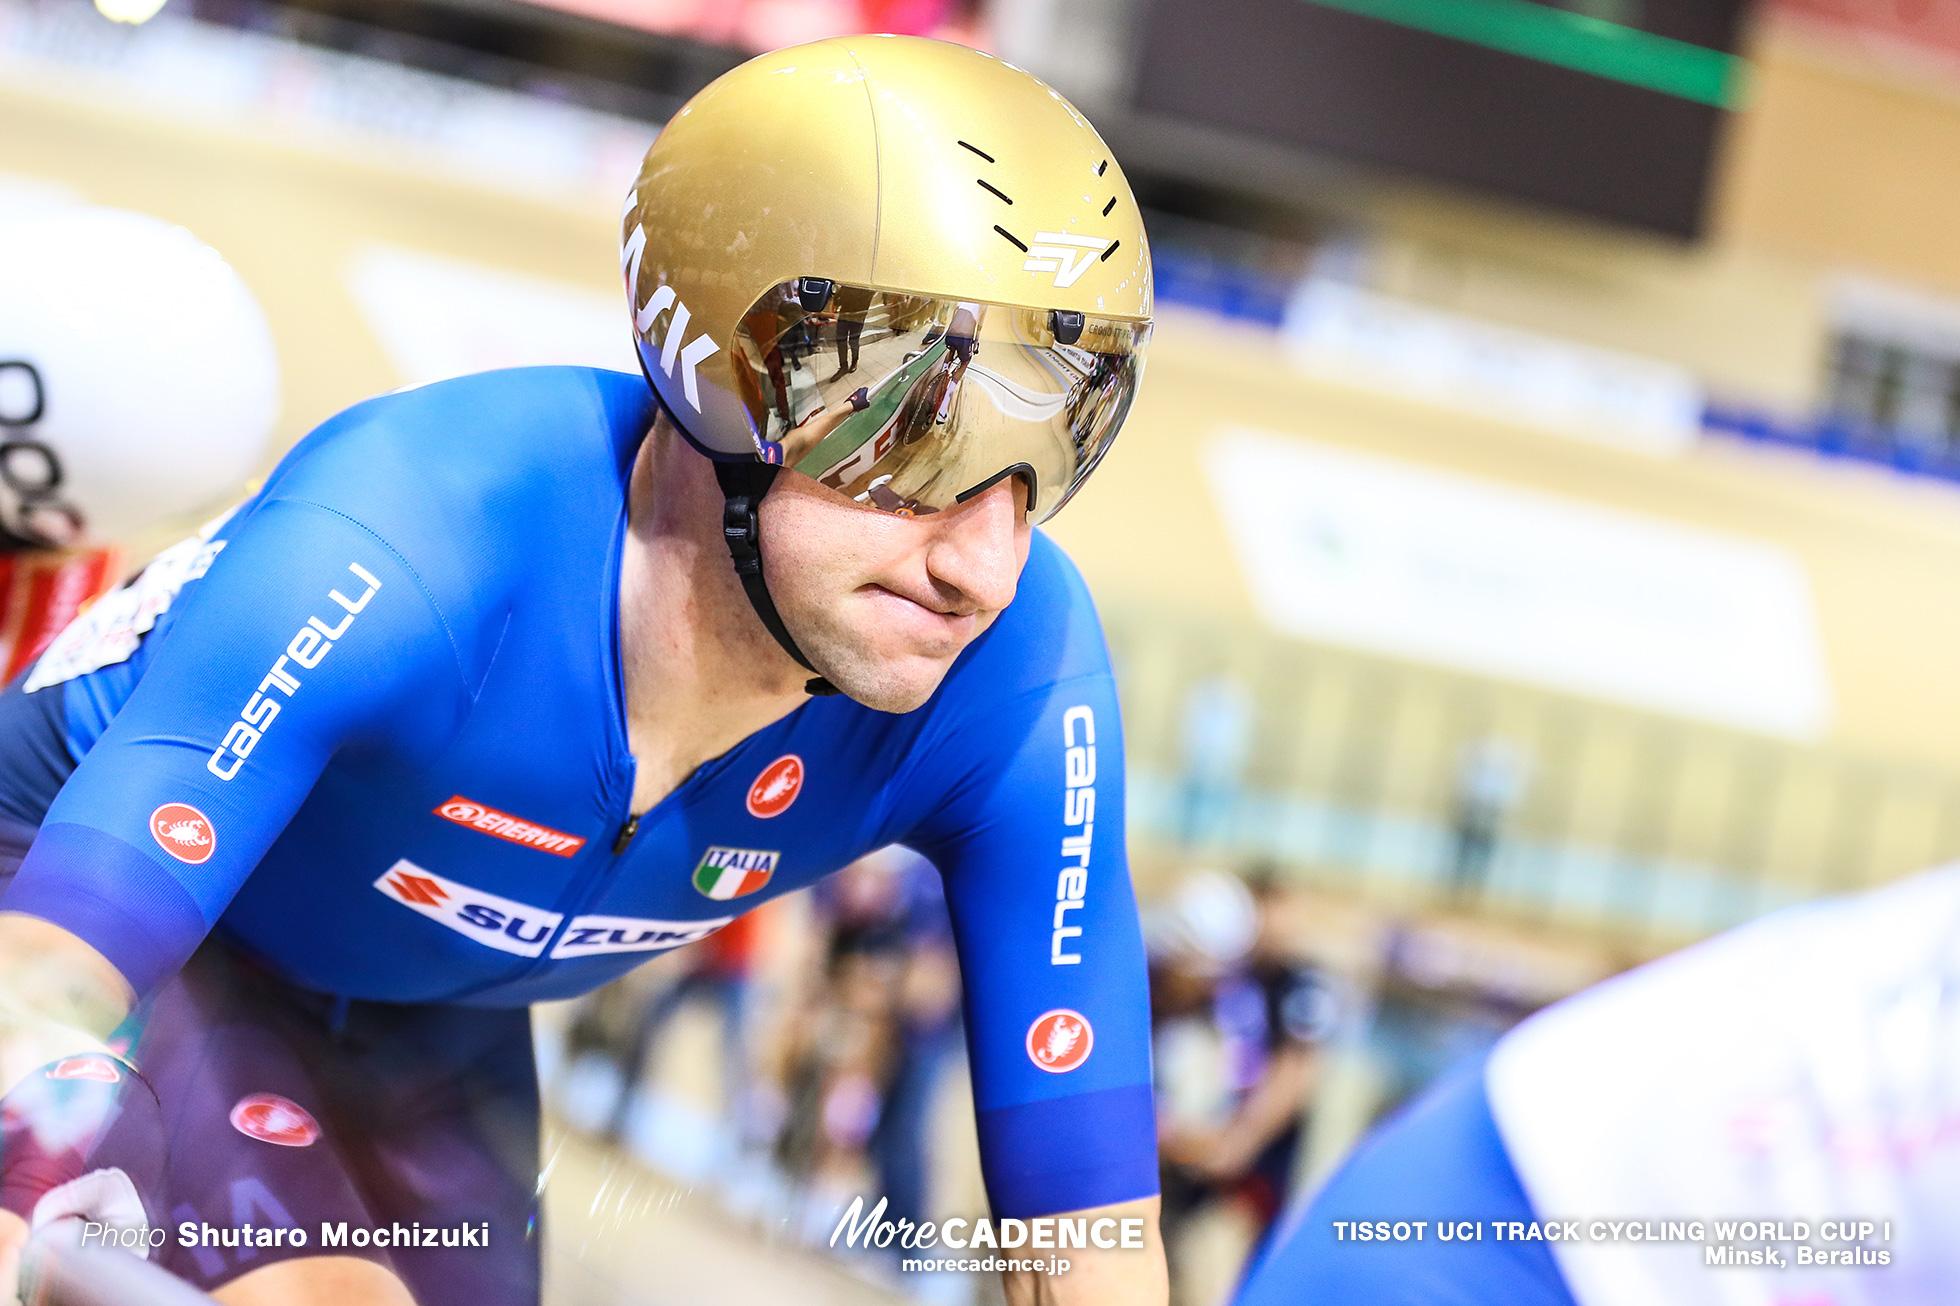 Elia Viviani (ITA), Point Race / Men's Omnium / TISSOT UCI TRACK CYCLING WORLD CUP I, Minsk, Beralus